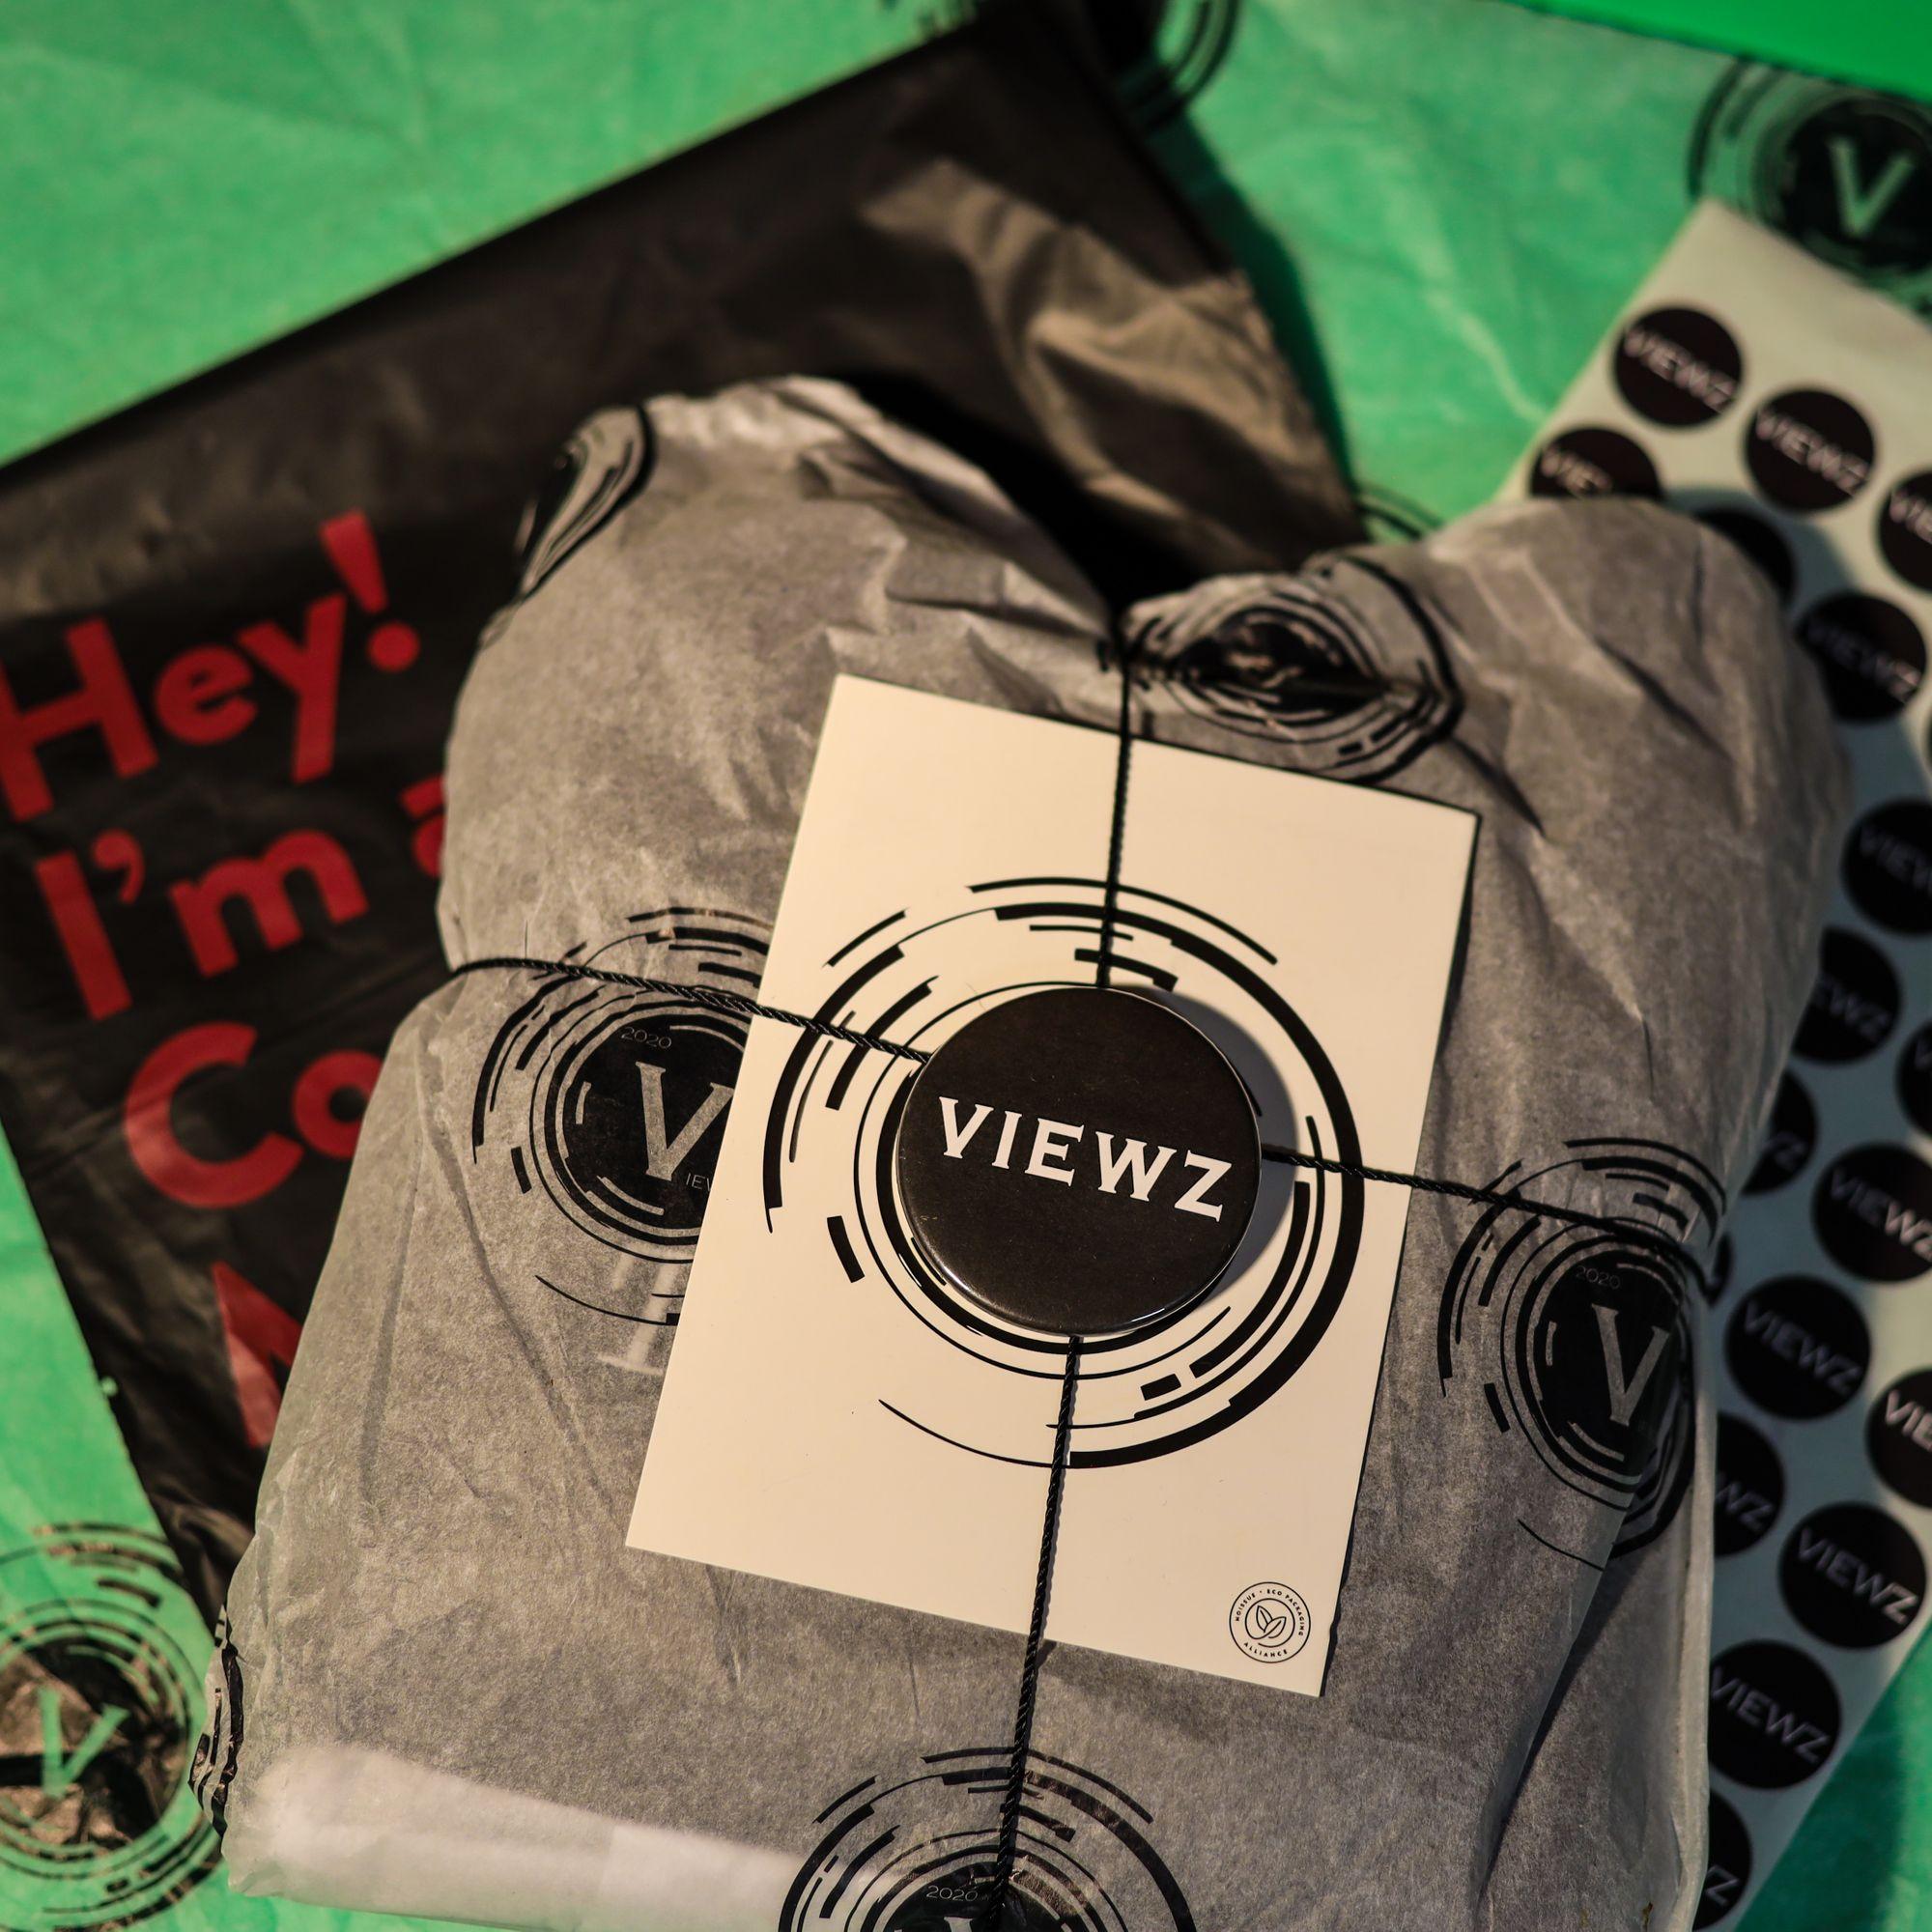 Wardrobe Staples that Promote Sustainability with Viewz